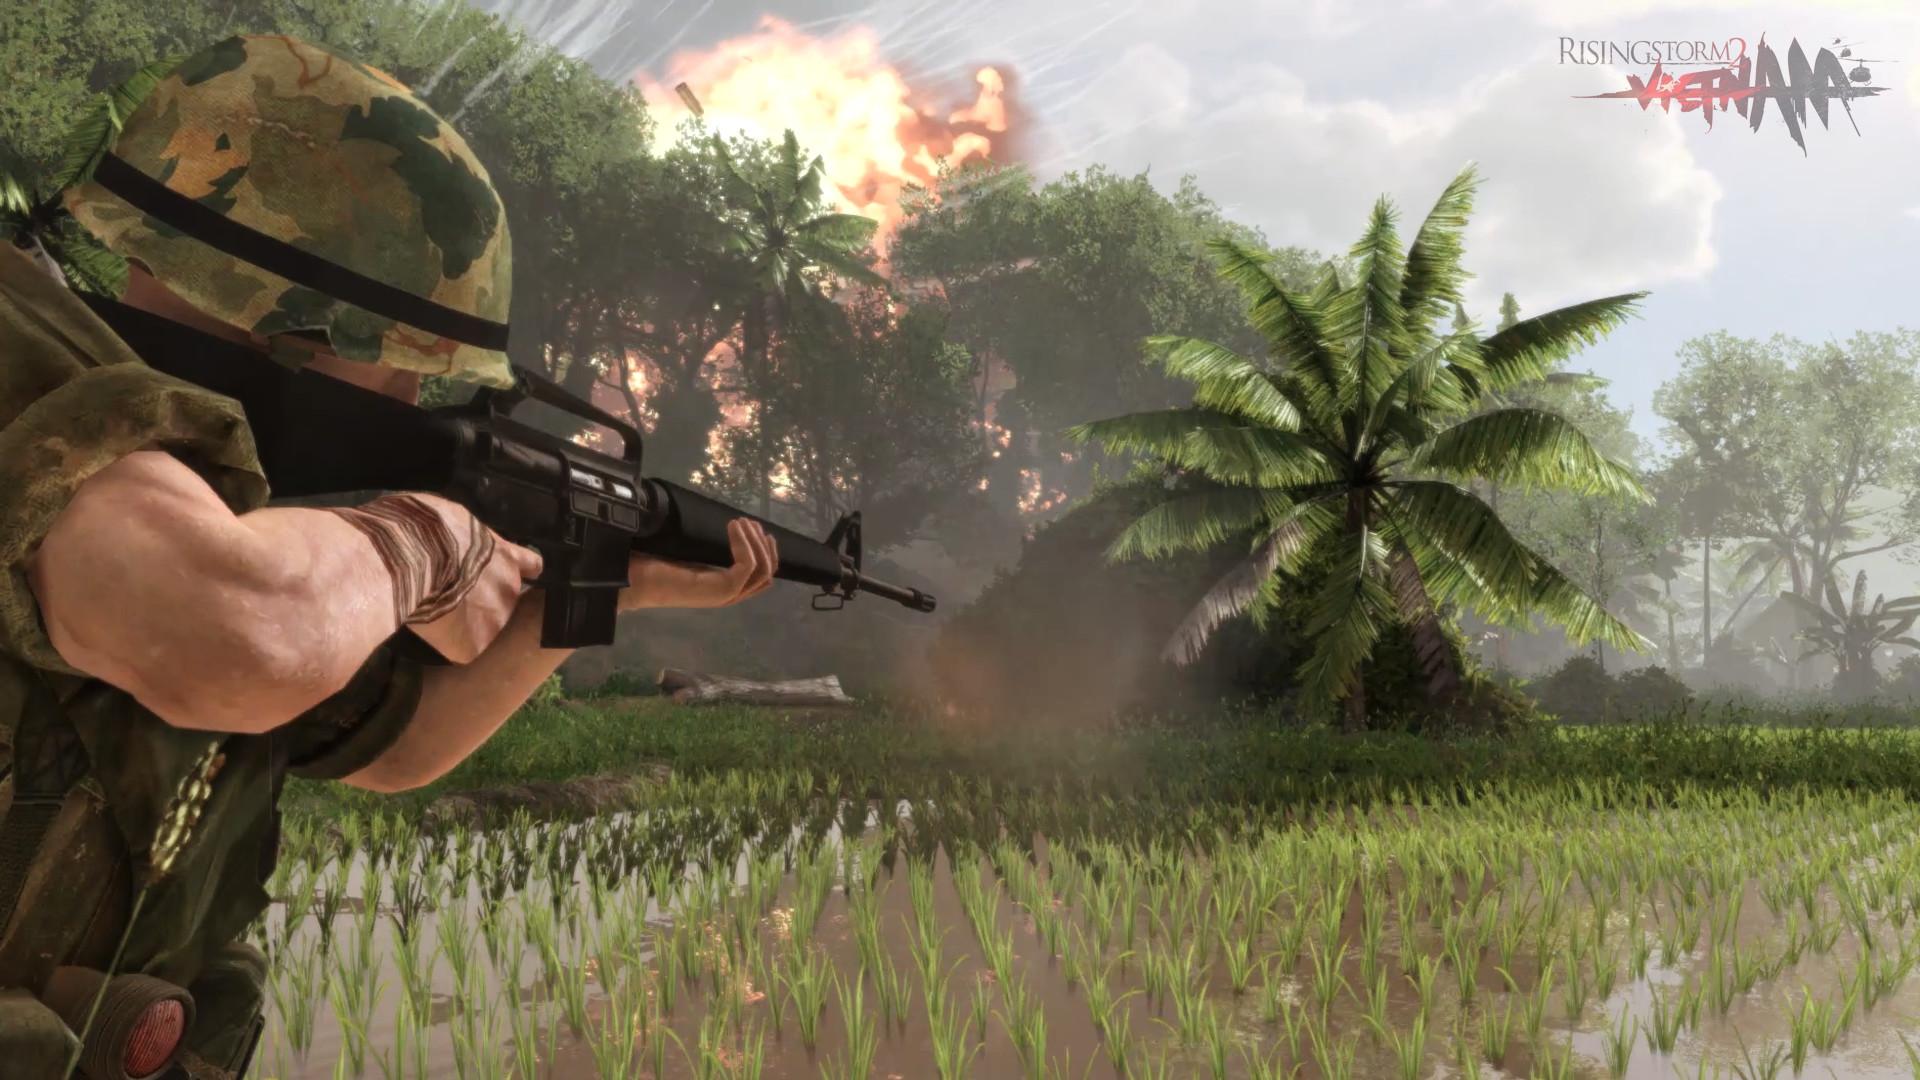 Military Camouflage Wallpaper Hd Rising Storm 2 Vietnam Trailer Shows Deep Customization